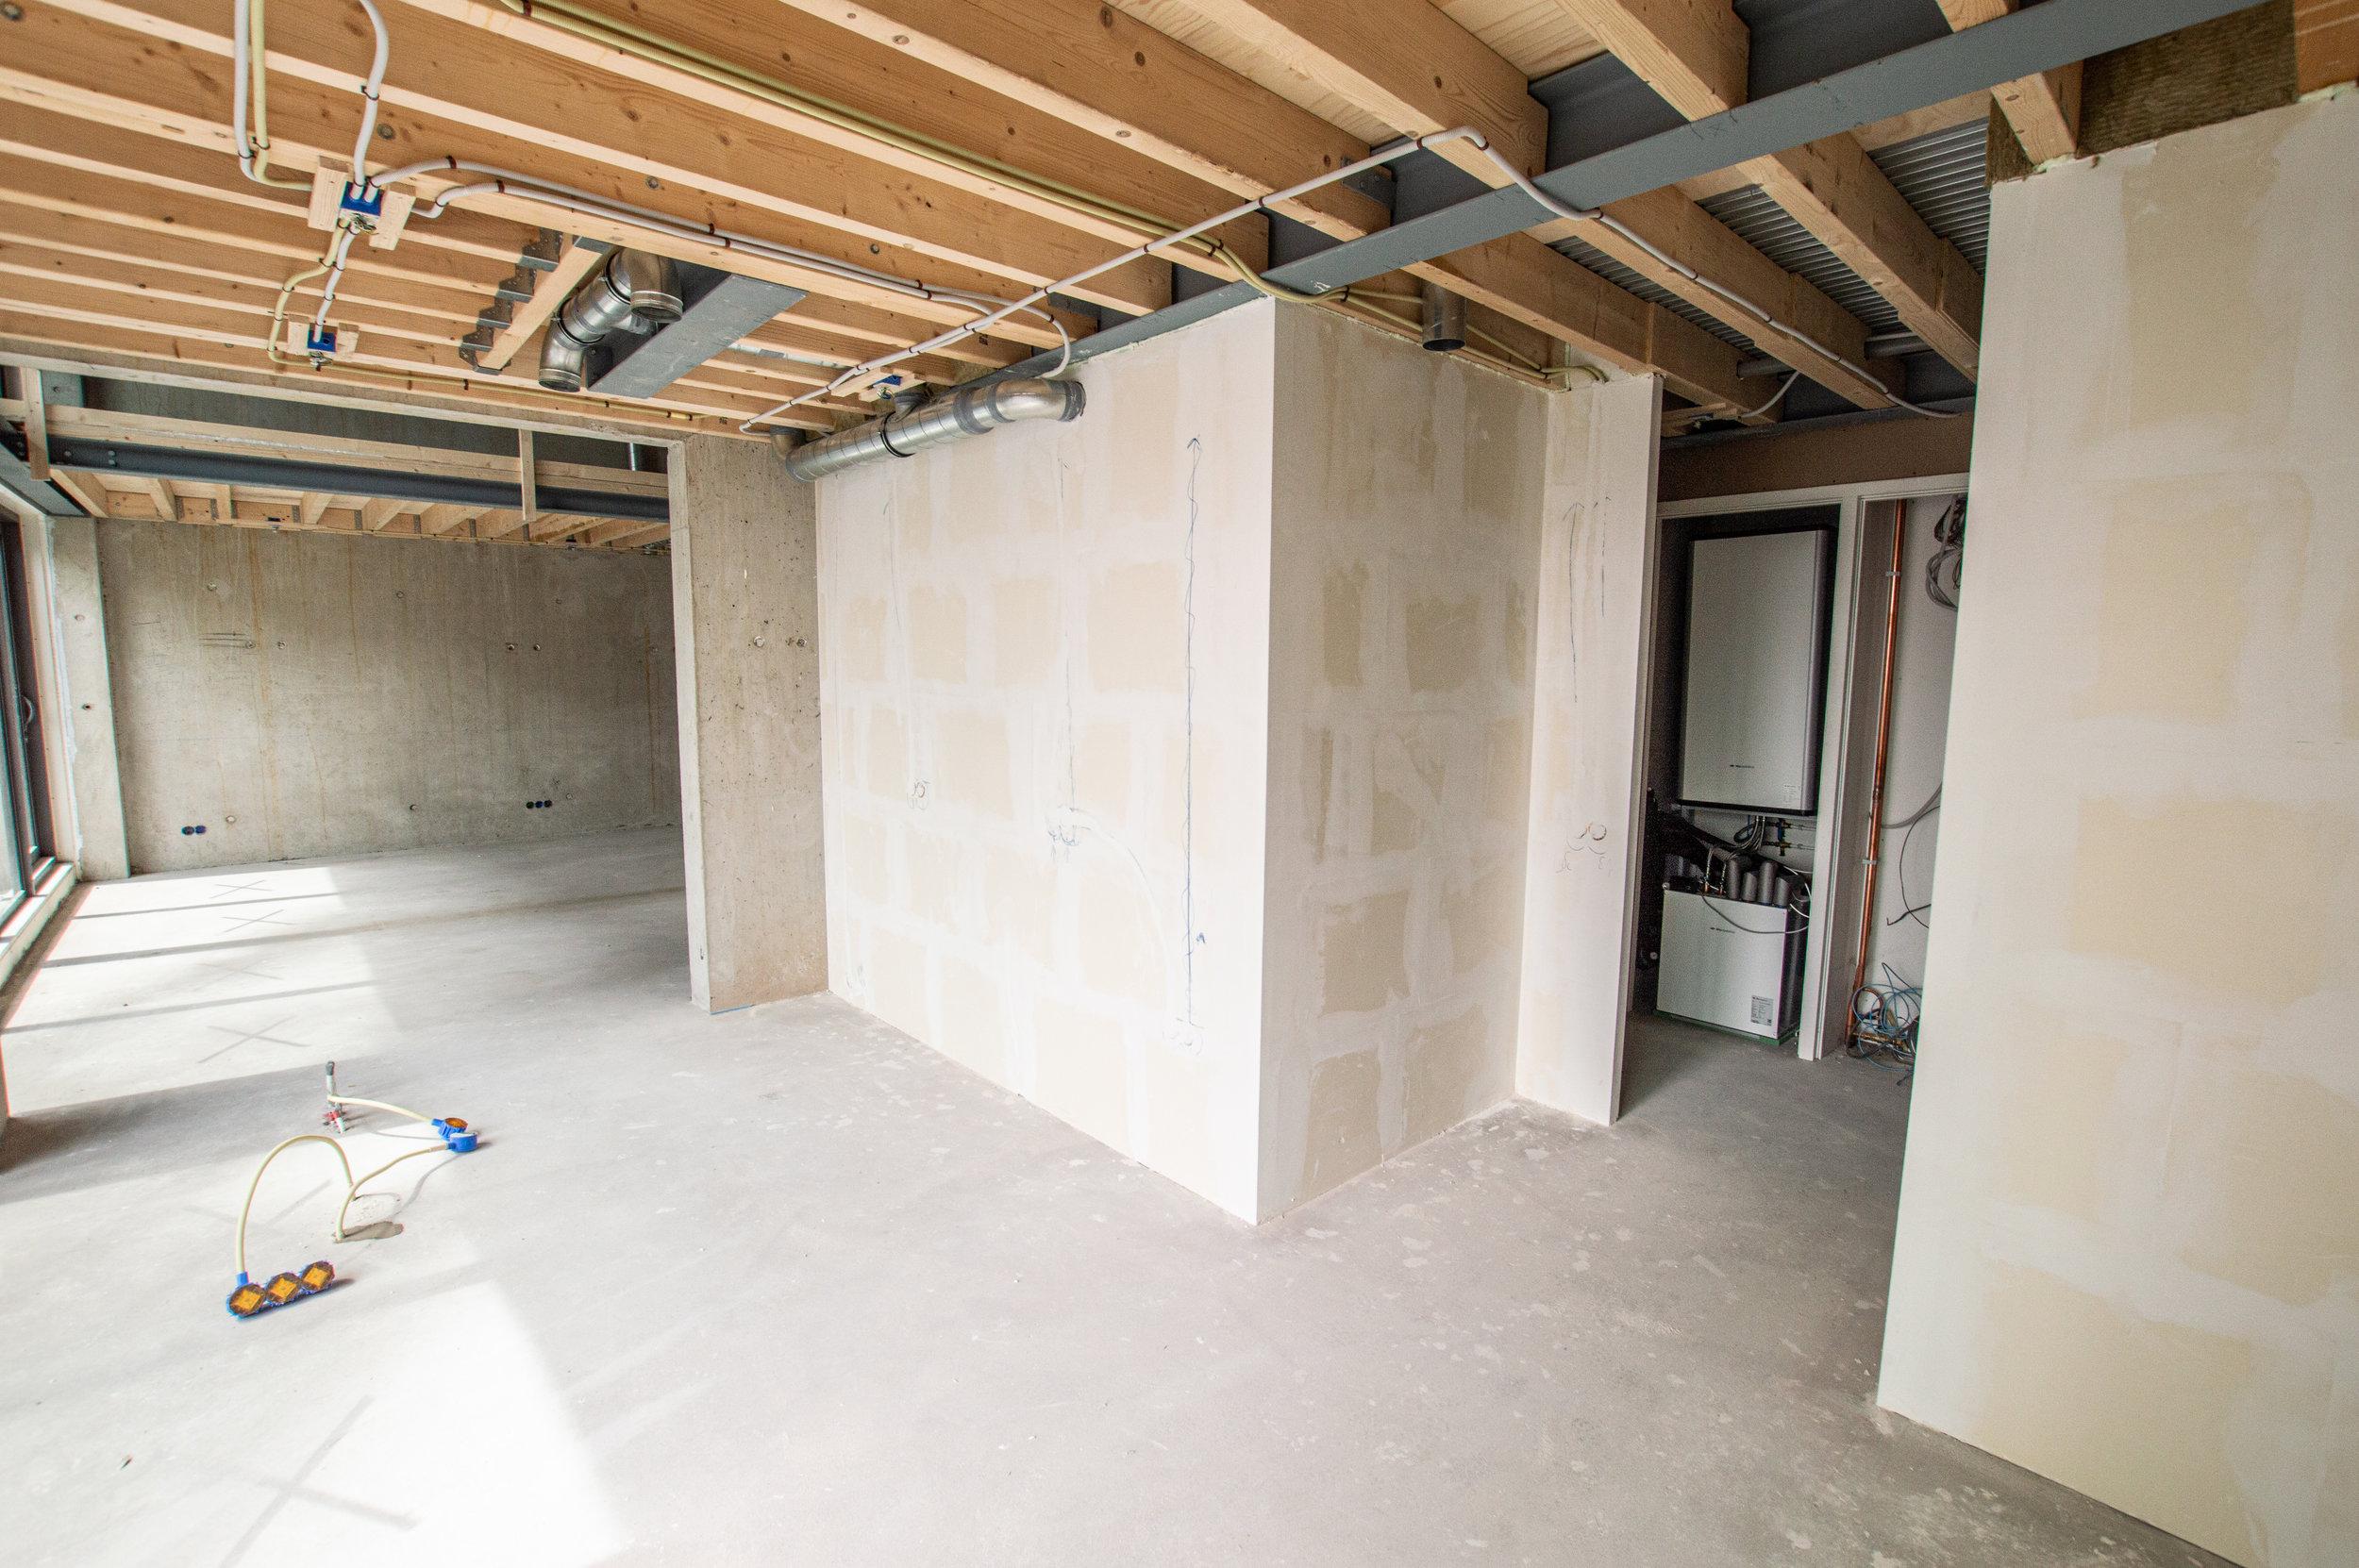 keukenblok open ruimte